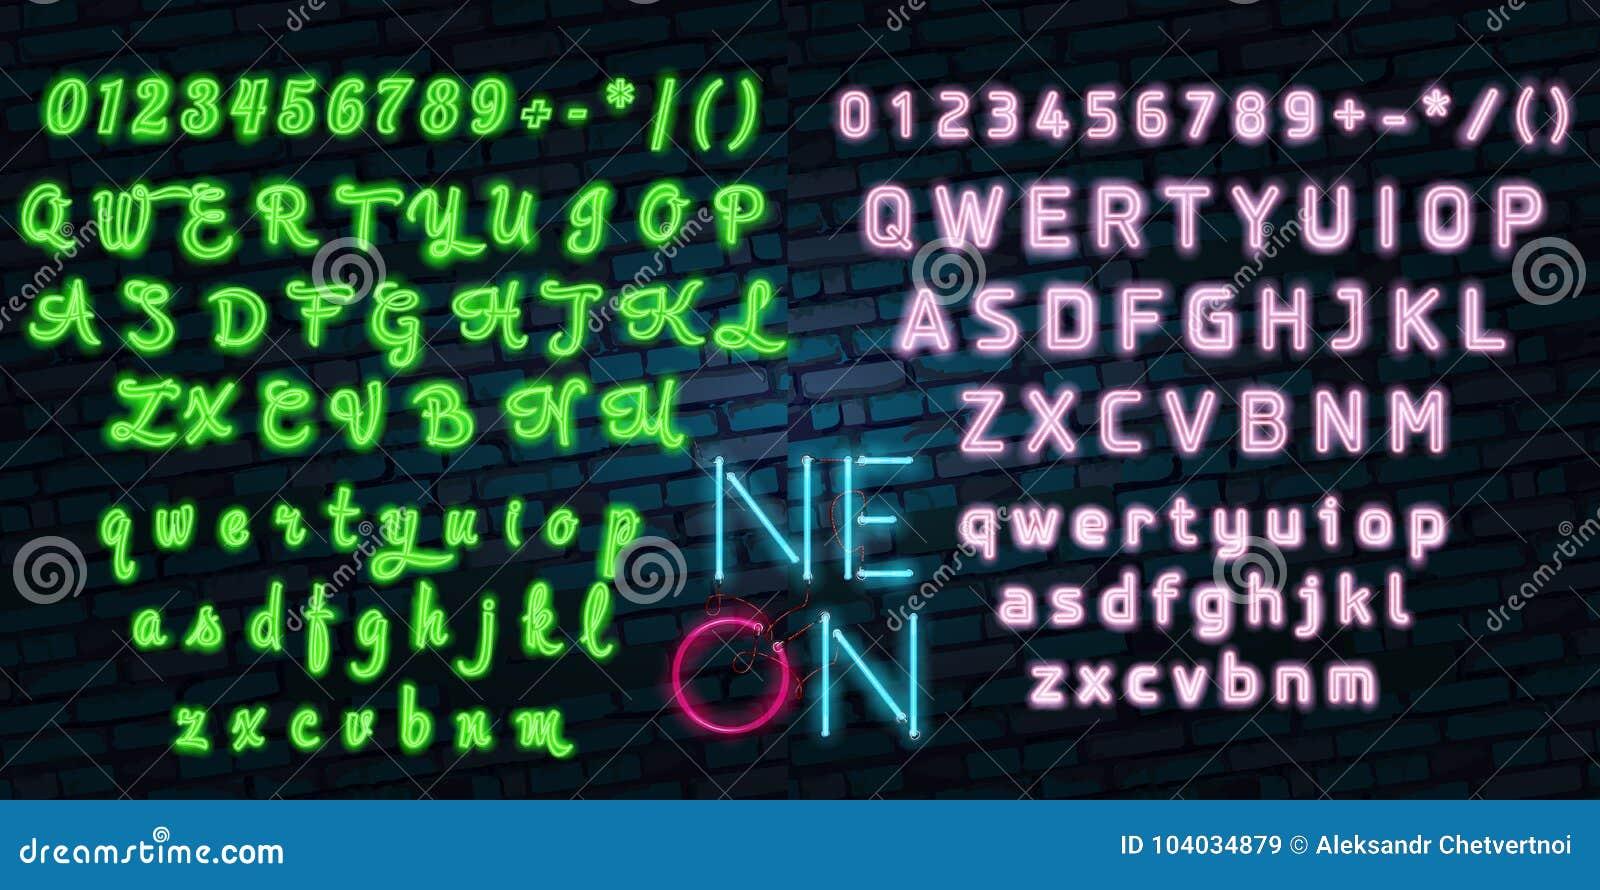 Realistic Detailed 3d Neon Lights Signs Set on a Blue Background Alphabet Font Design Element.